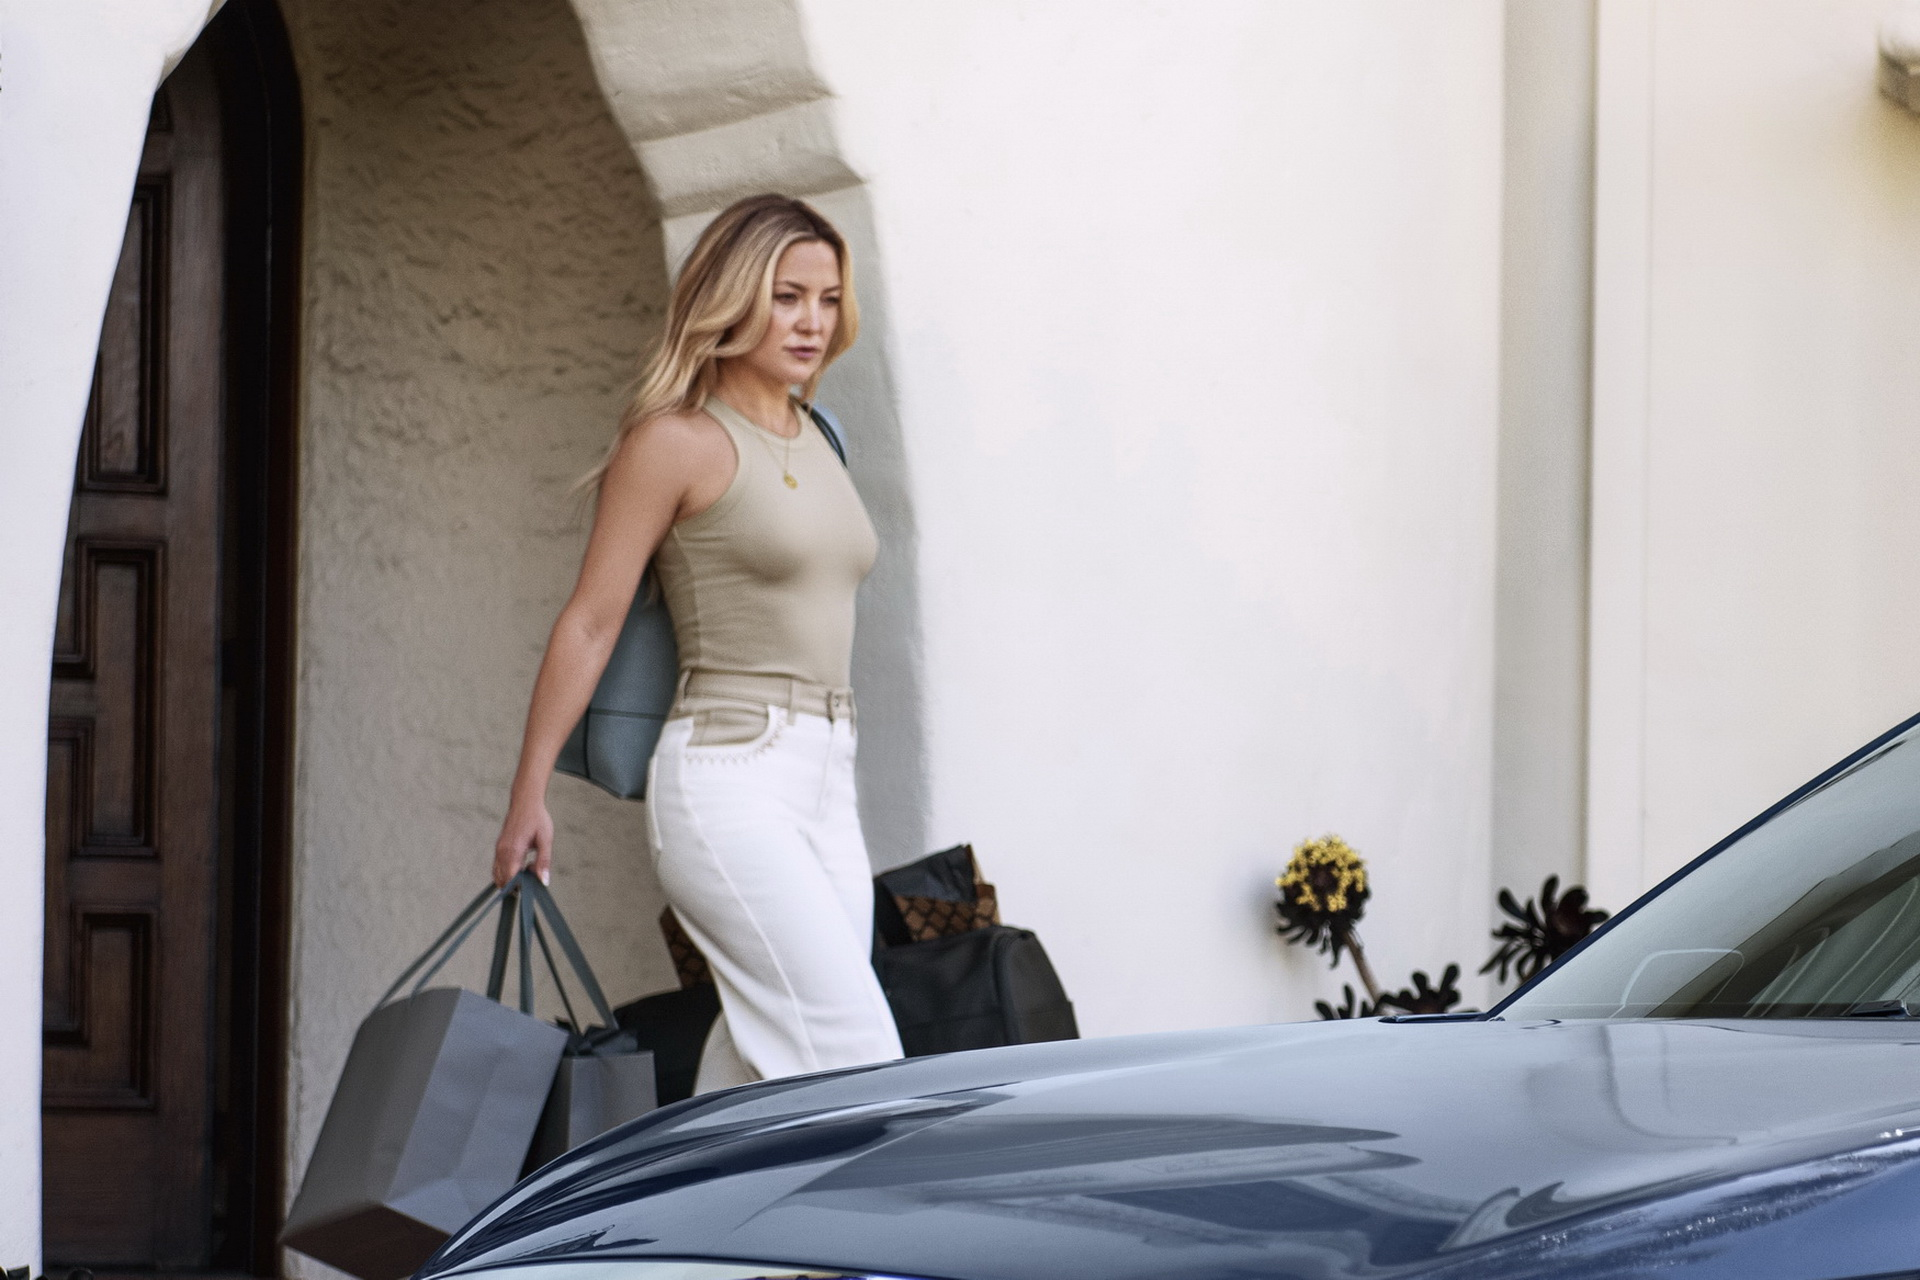 Звезда Голливуда Кейт Хадсон снялась в ролике для INFINITI QX60